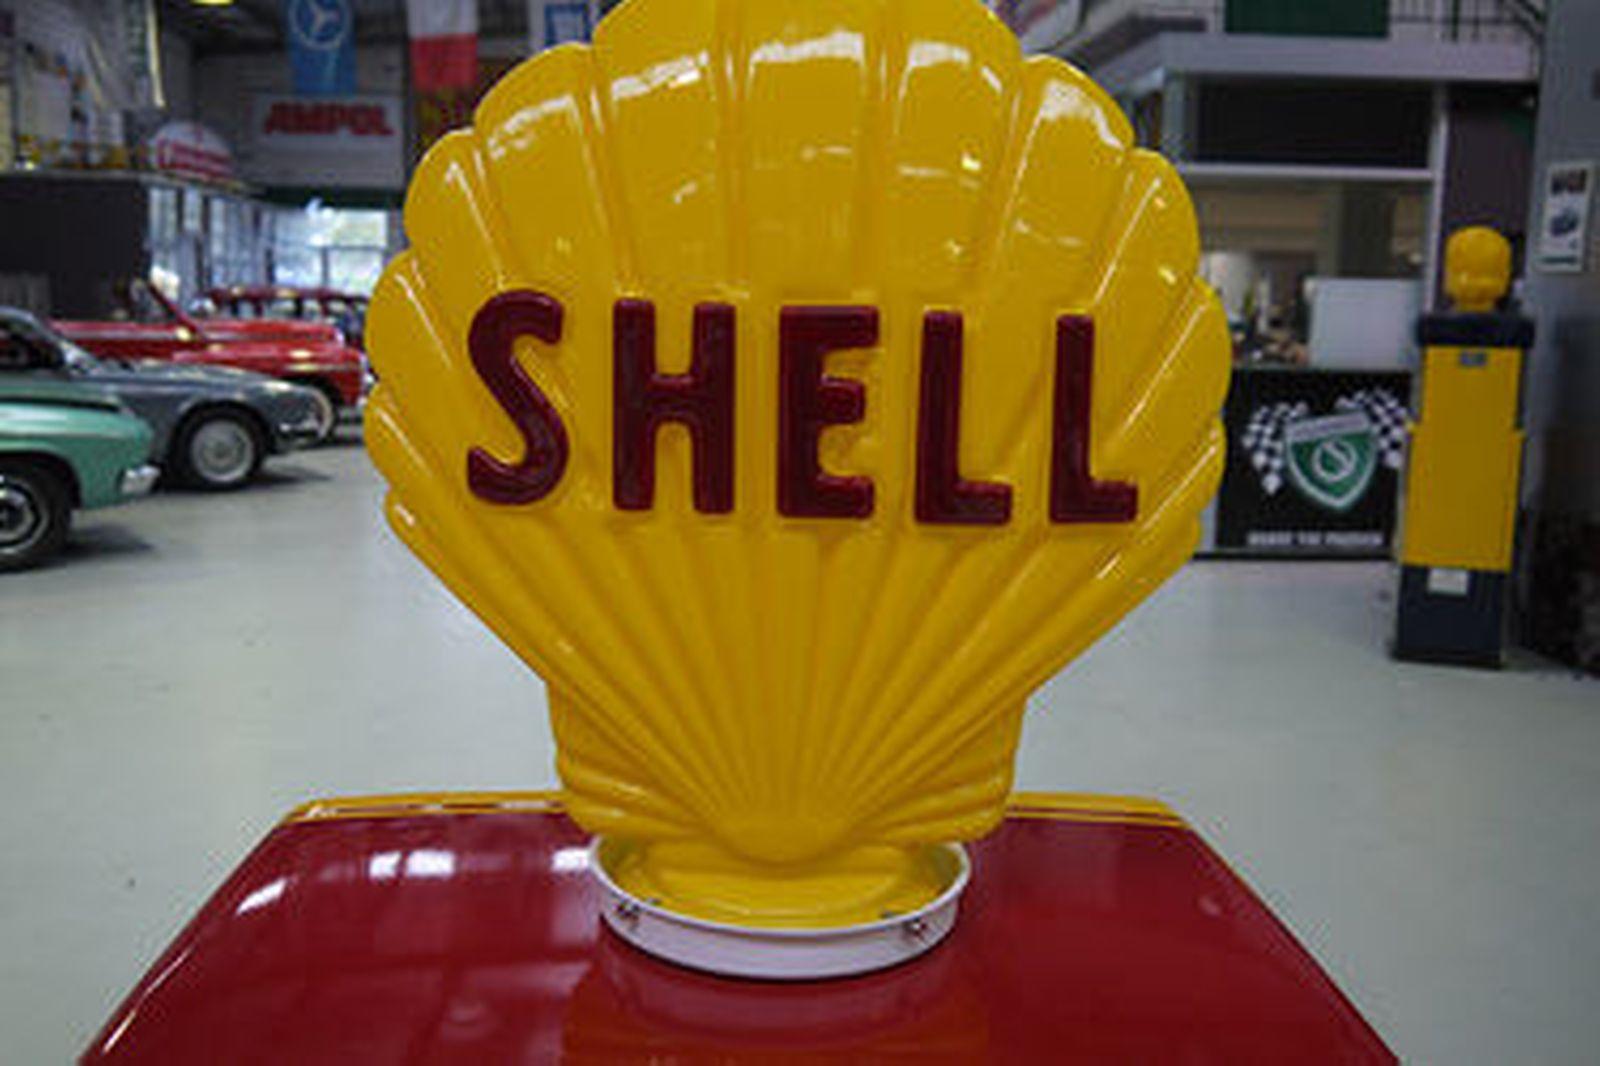 Petrol Pump - Wayne 605 Industrial in Shell Racing Livery (cosmetically restored